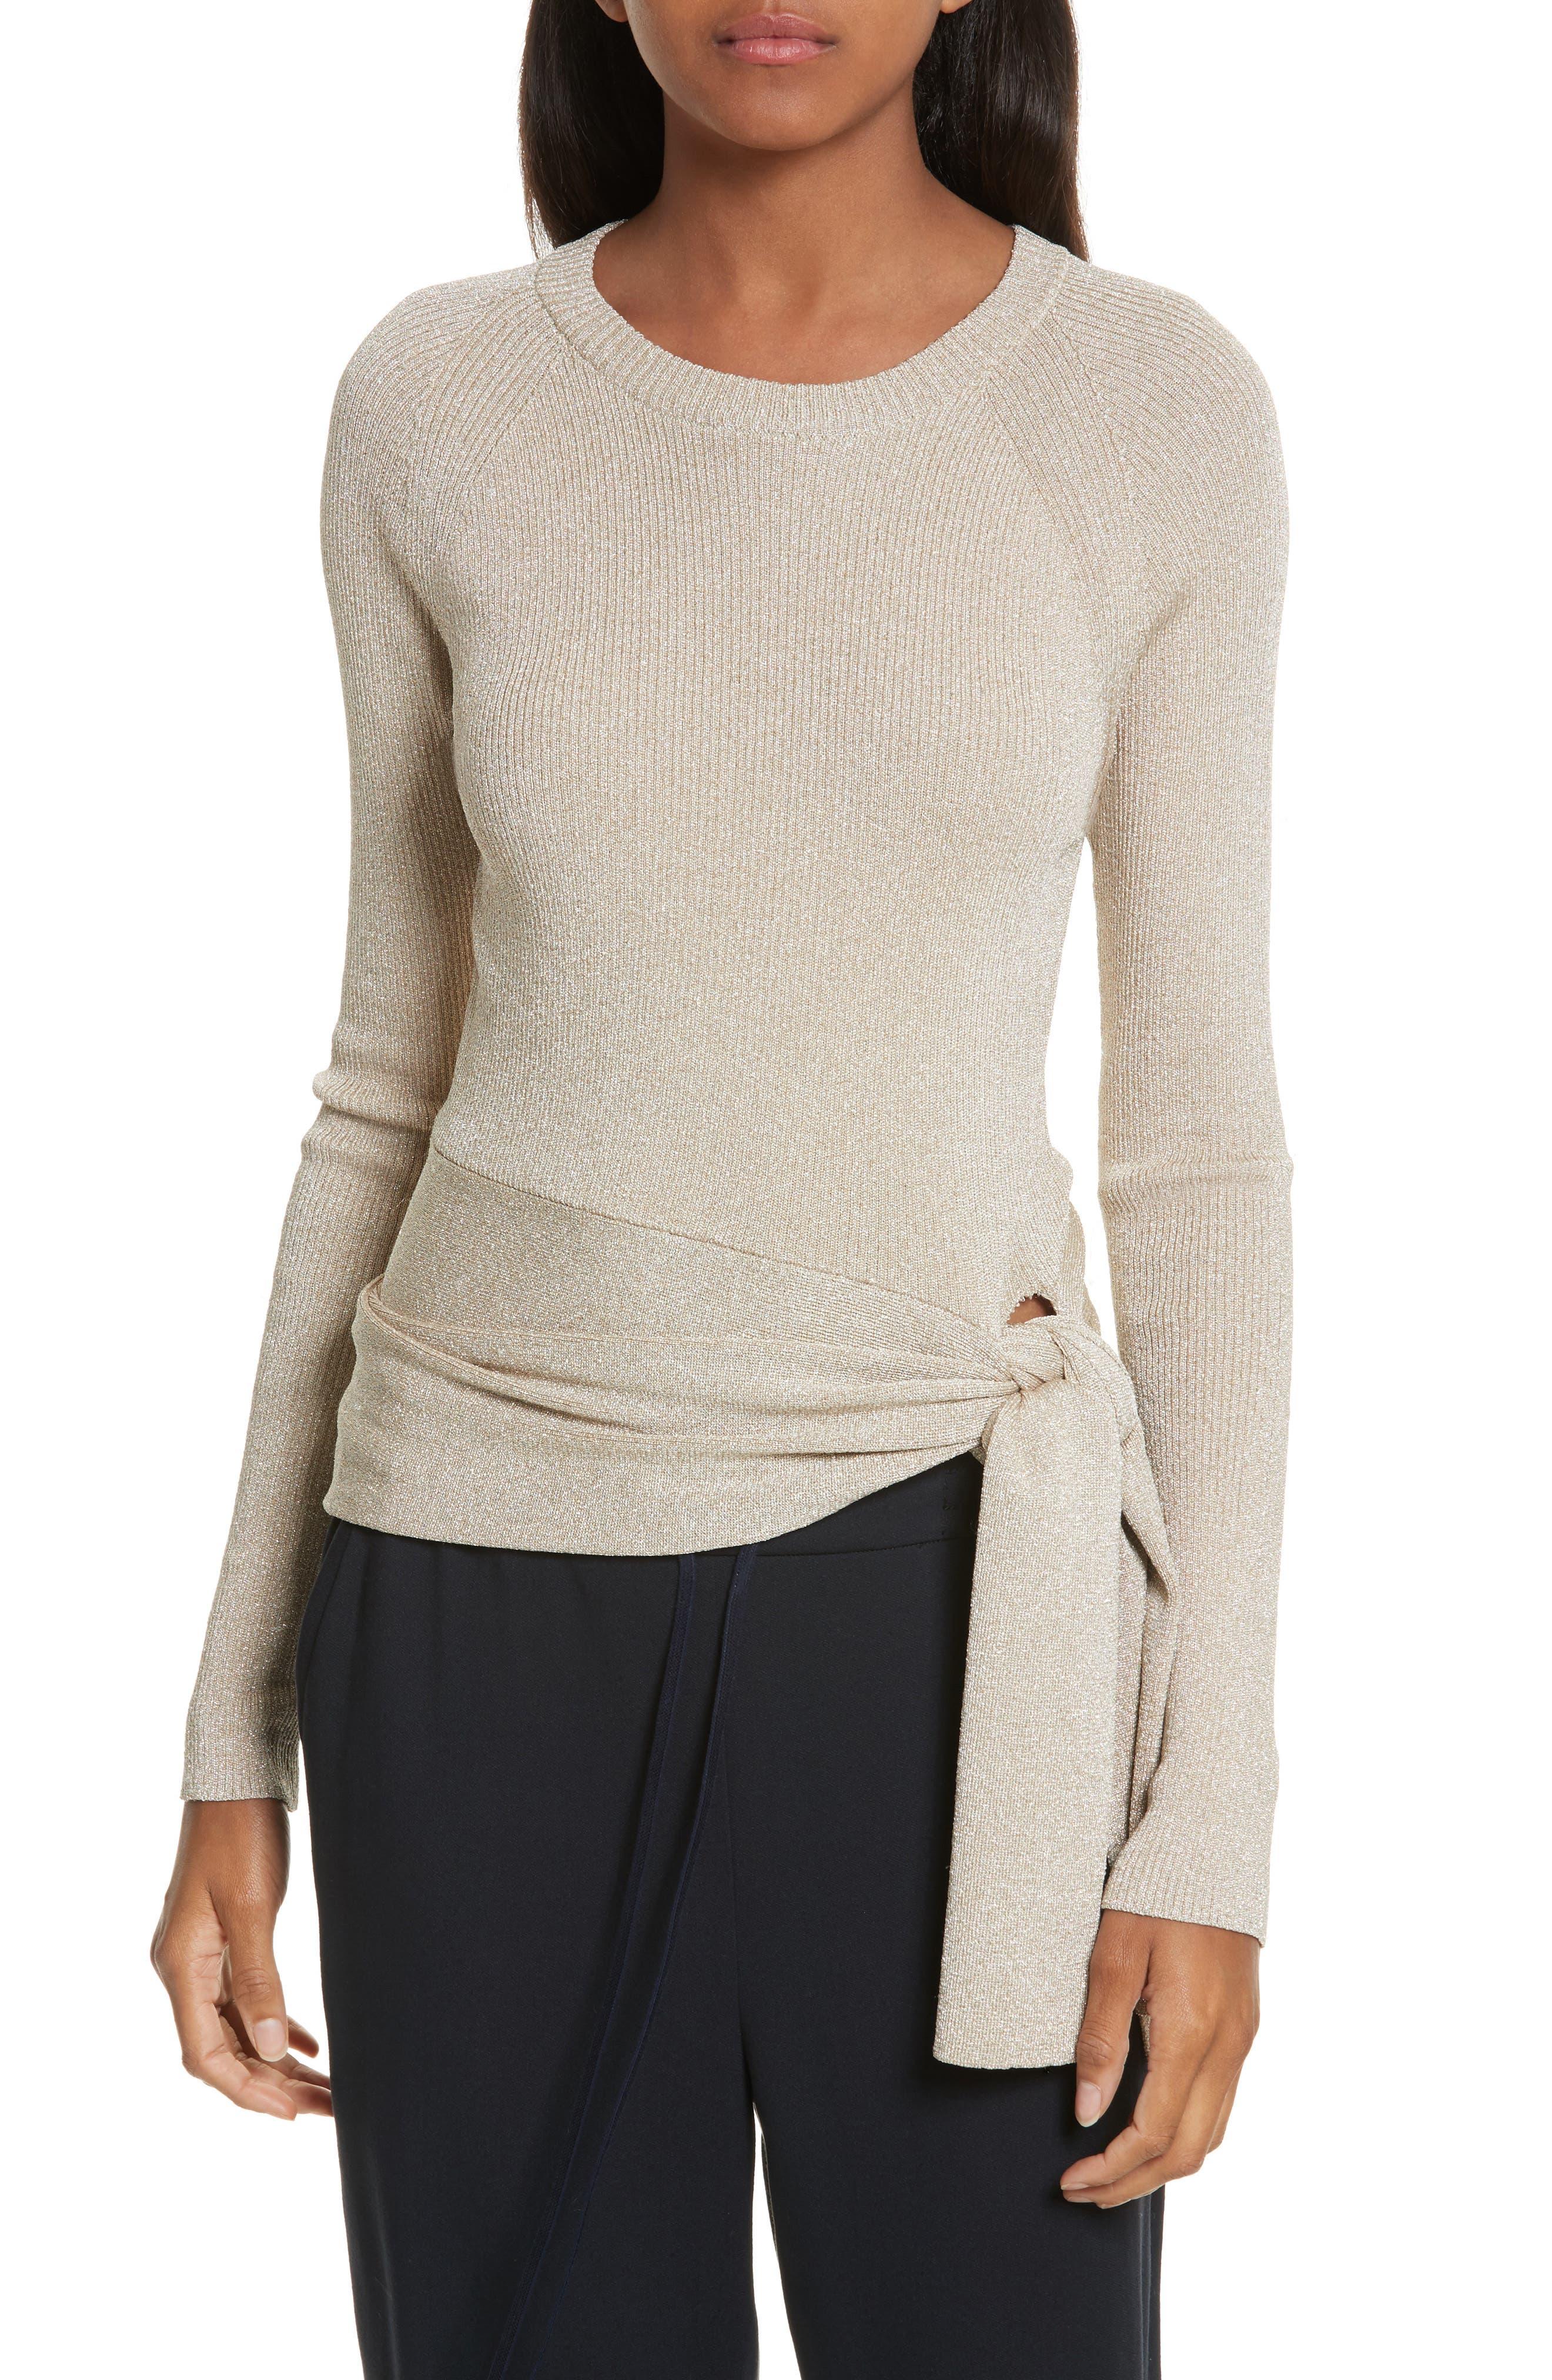 Main Image - 3.1 Phillip Lim Metallic Side Tie Sweater